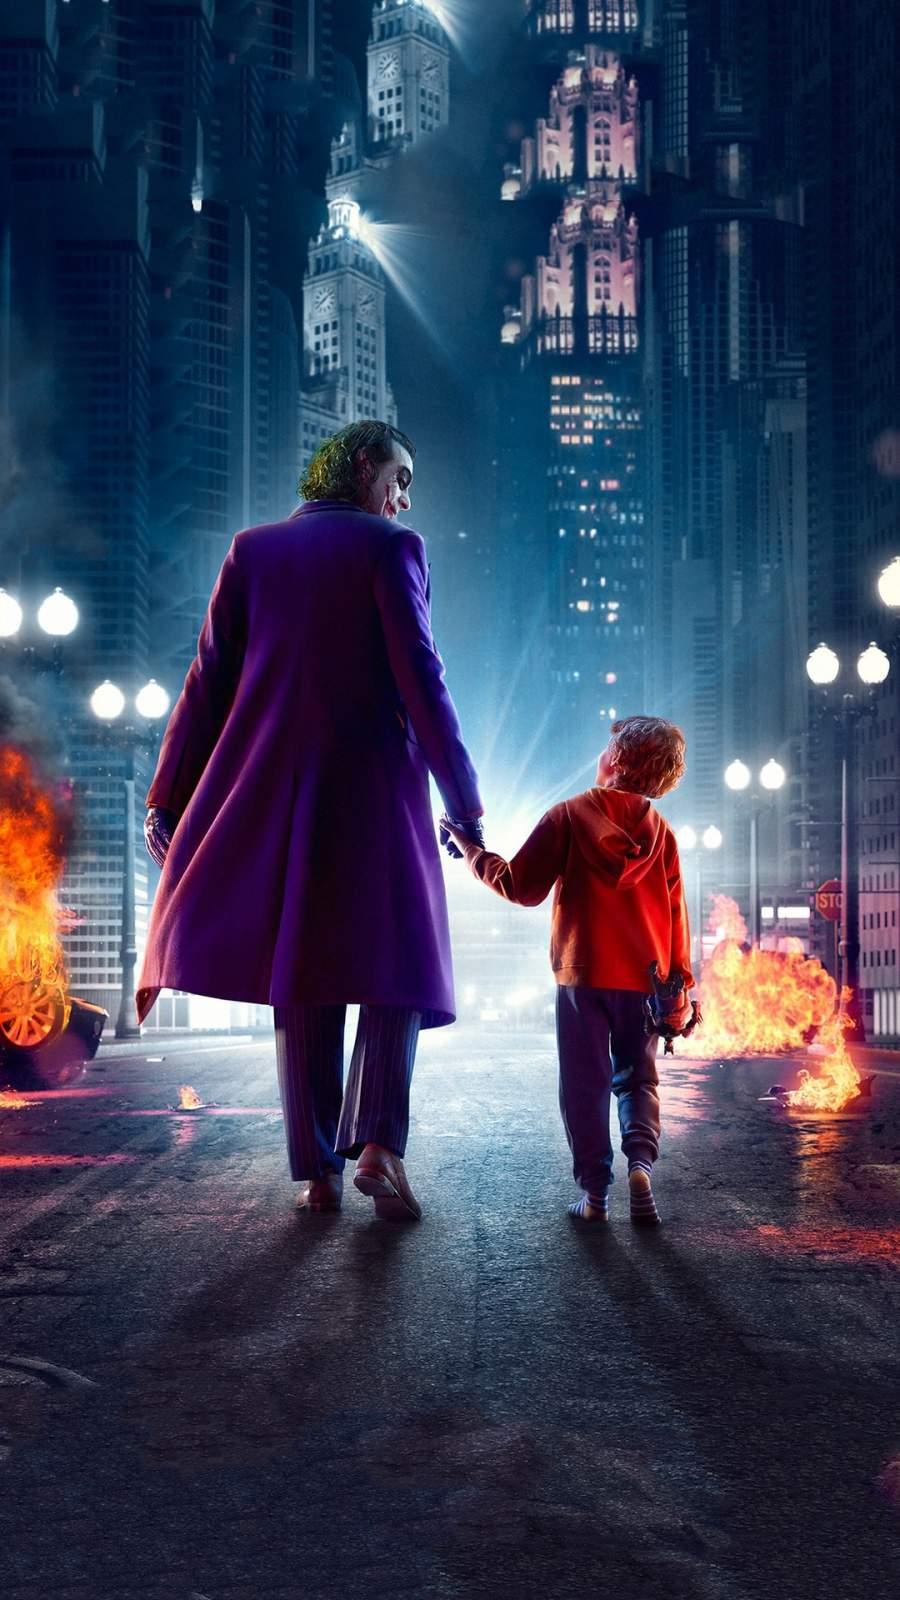 Joker Walking with Kid iPhone Wallpaper